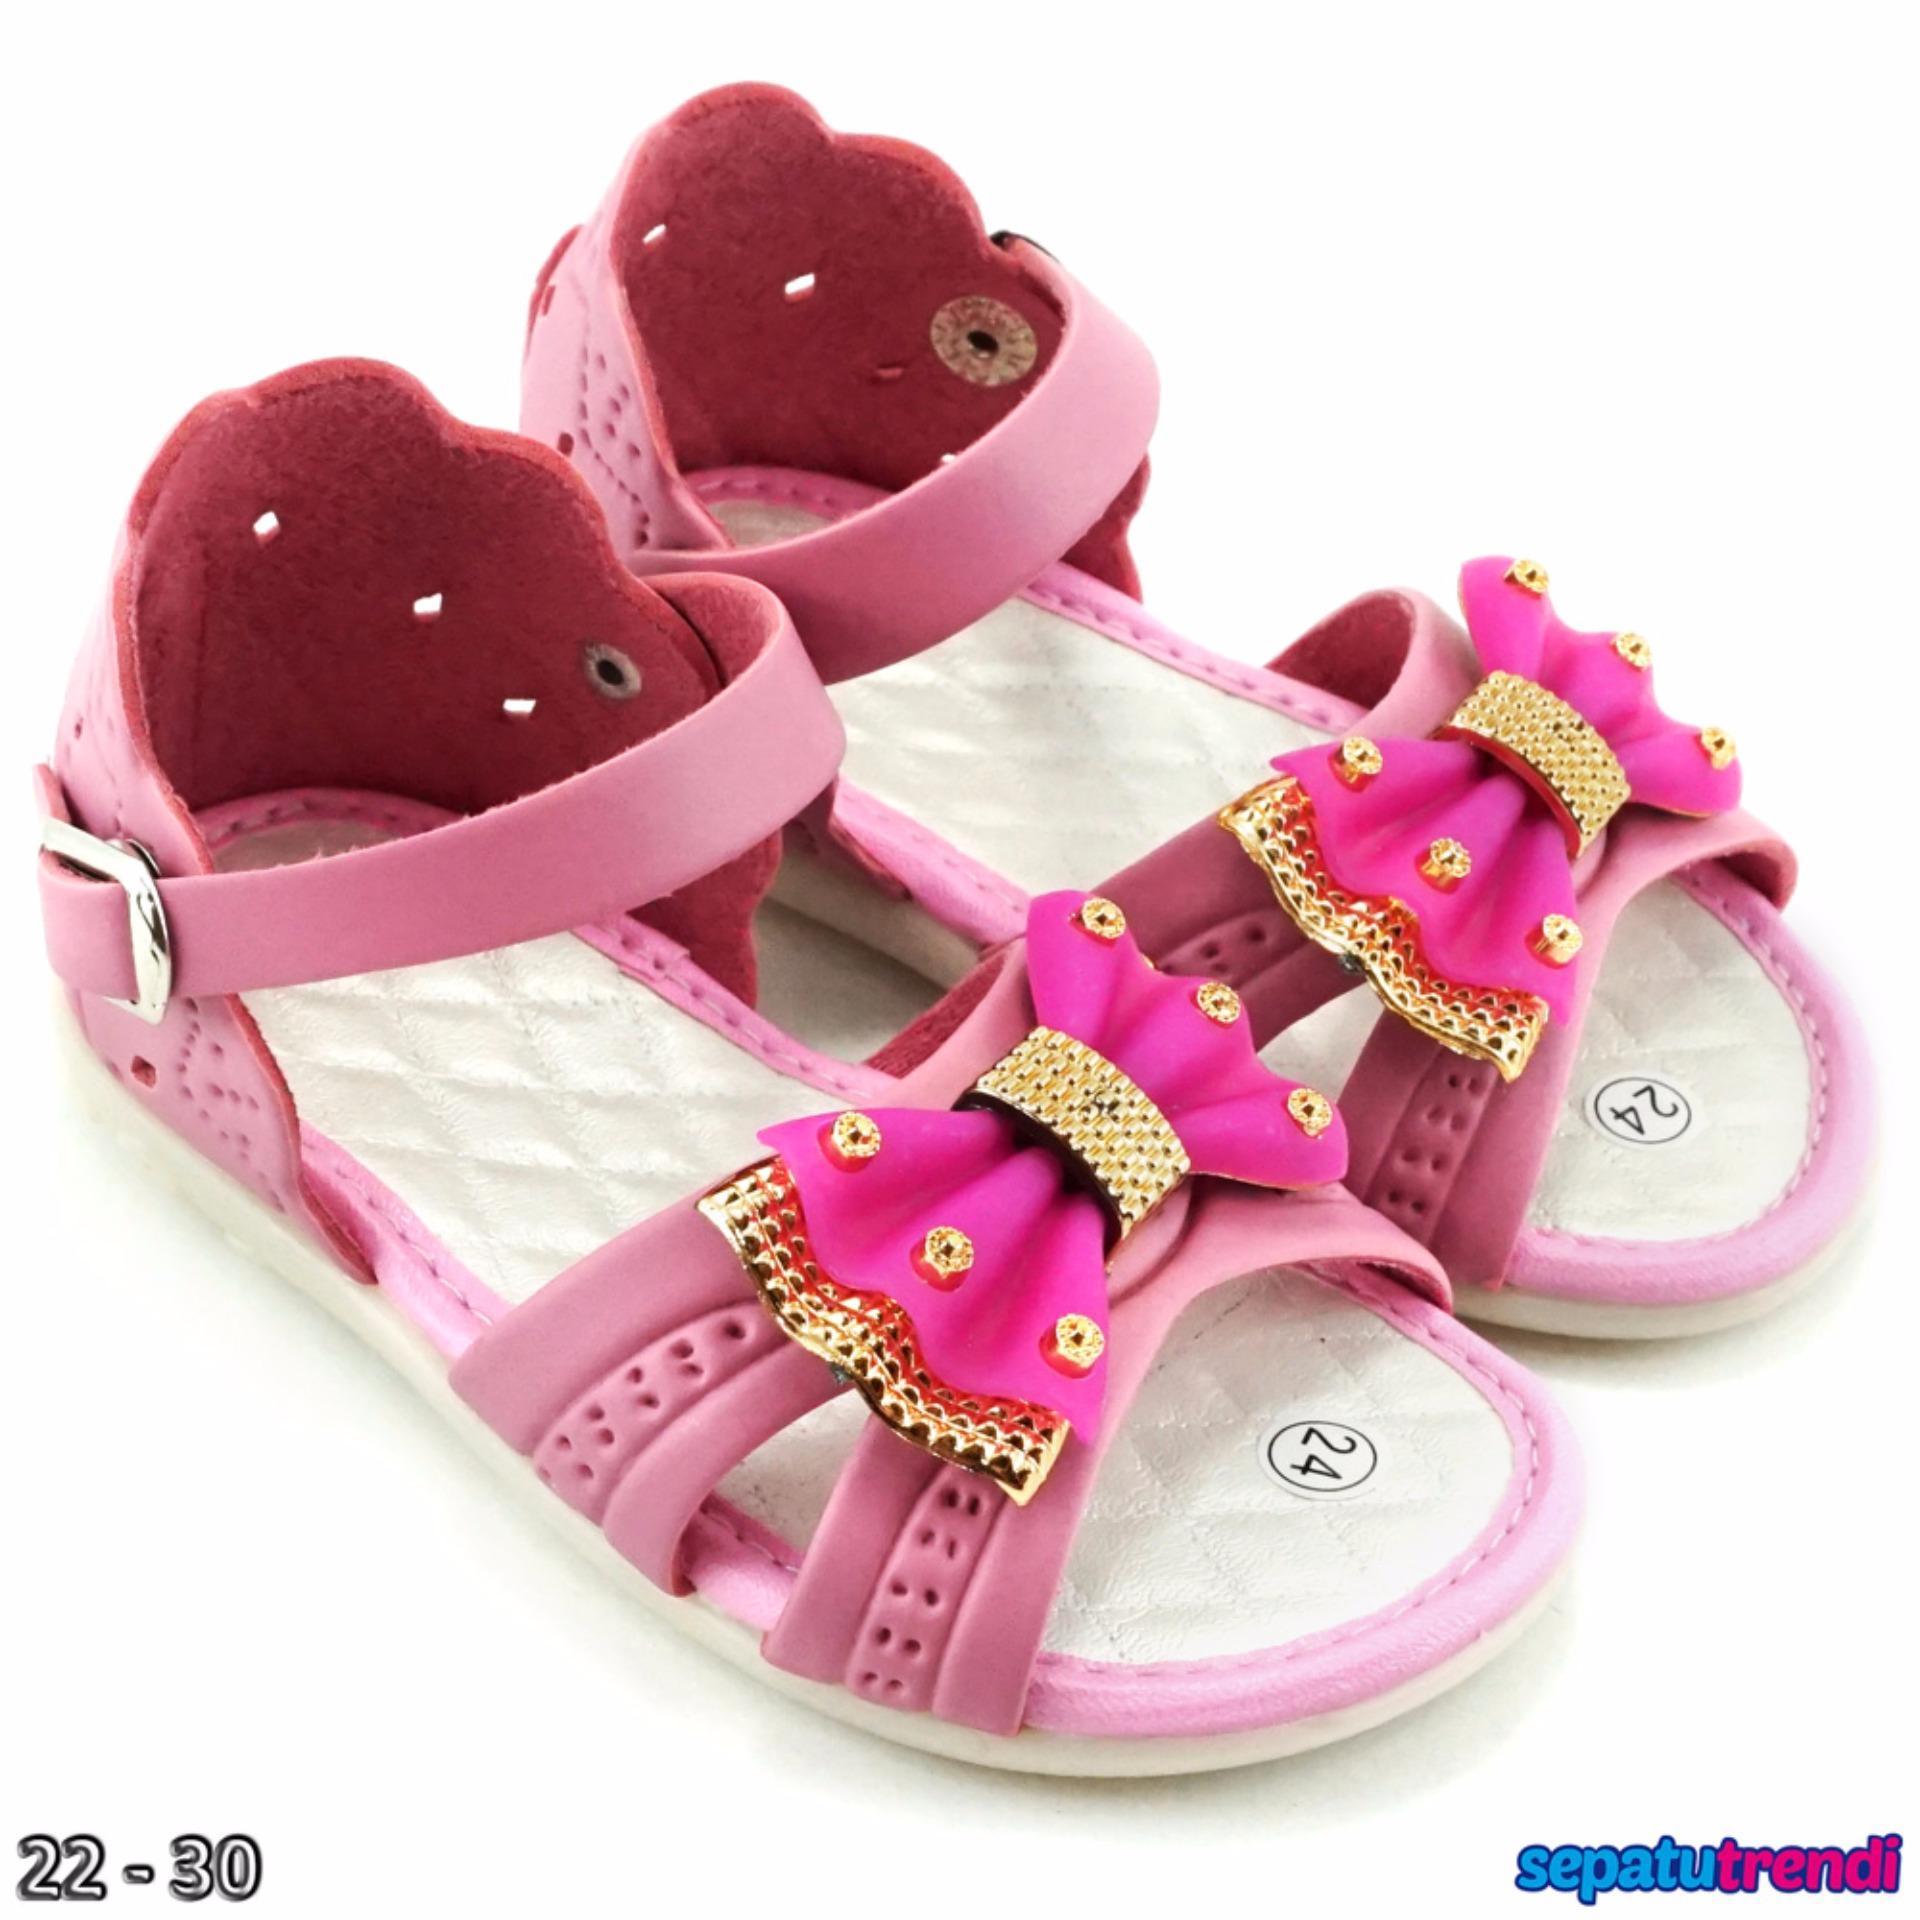 TrendiShoes Sandal Anak Perempuan Variasi Pita KX06 - Pink 31d0ccfbcc